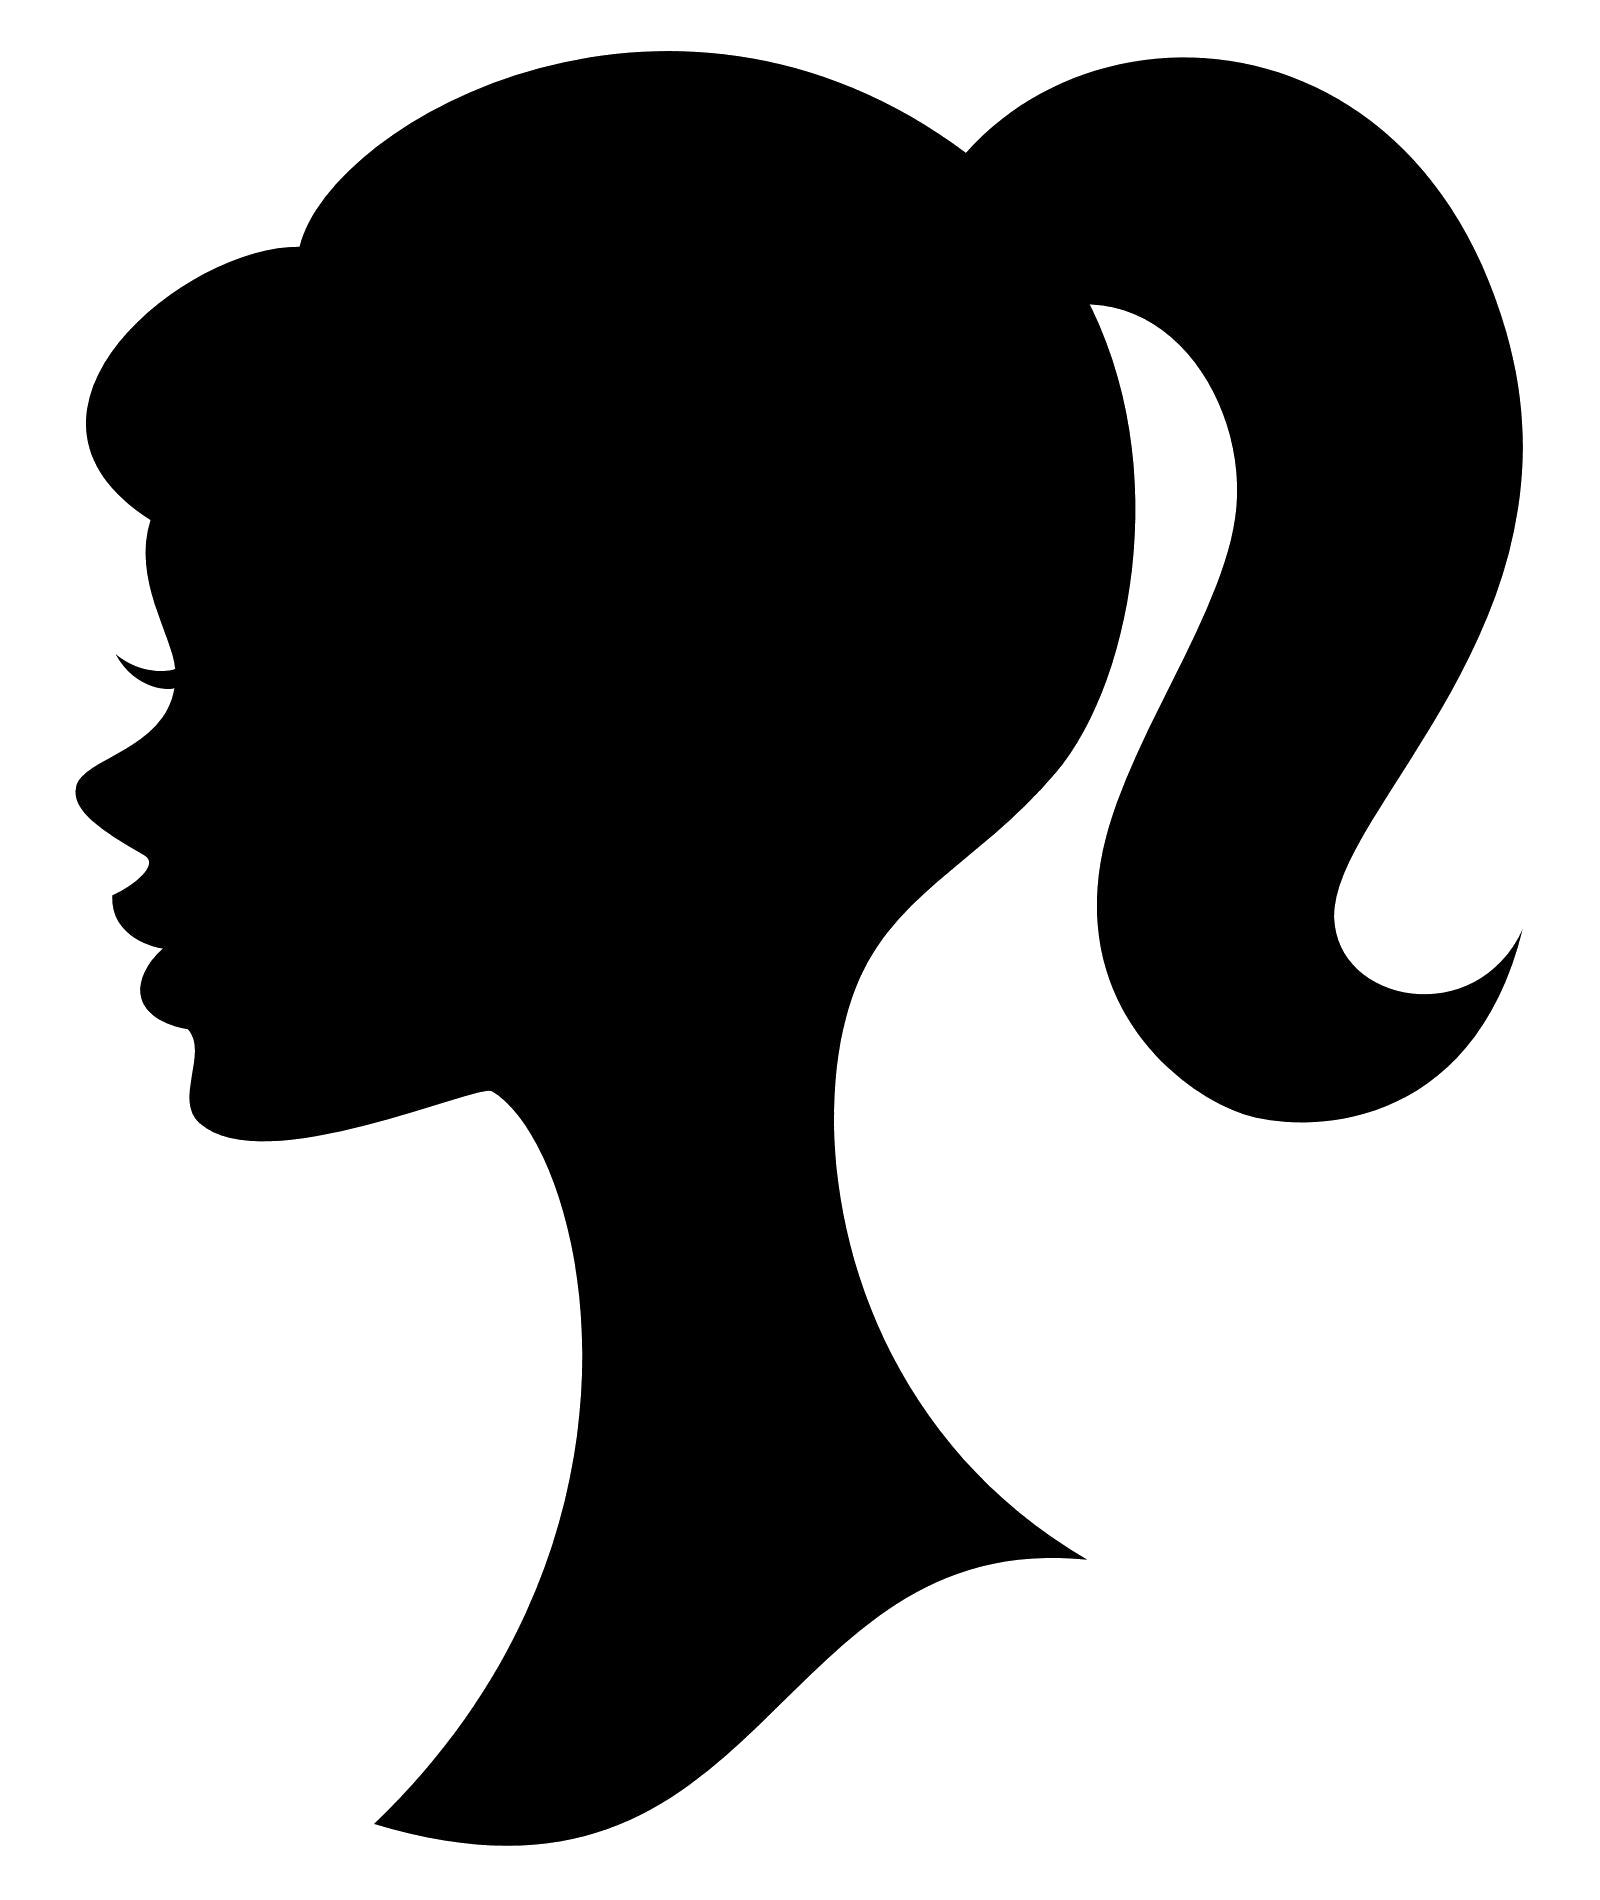 Barbie clipart silhouette. Panda free images clip